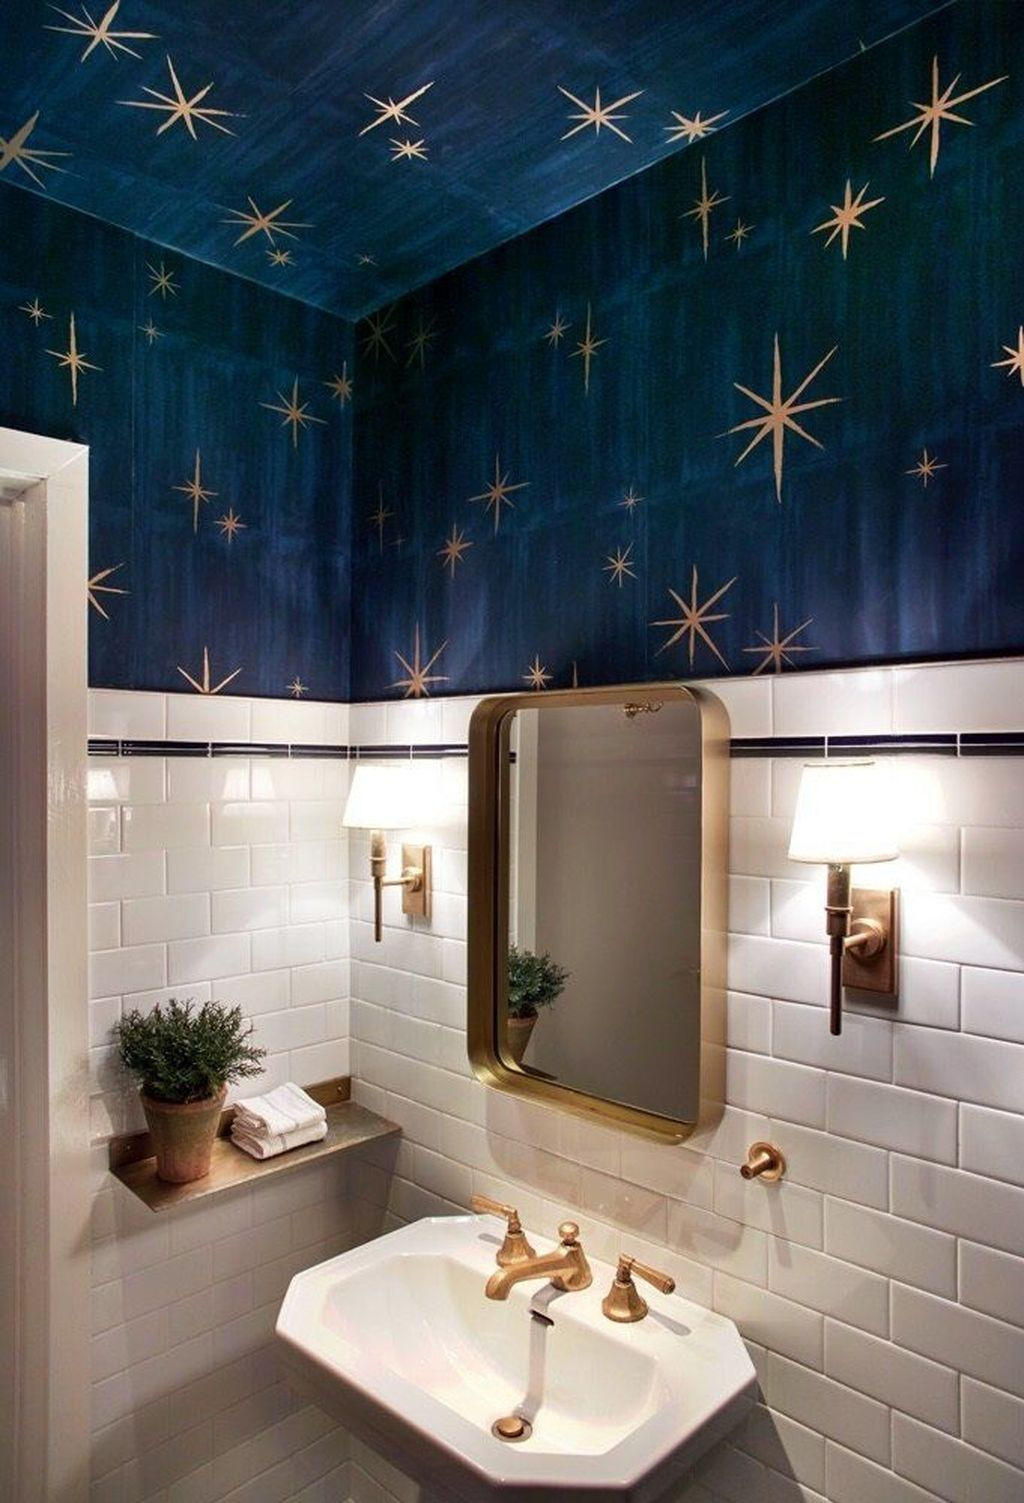 48 Popular Bathroom Wallpaper Ideas Room Wallpaper House Design Home Decor